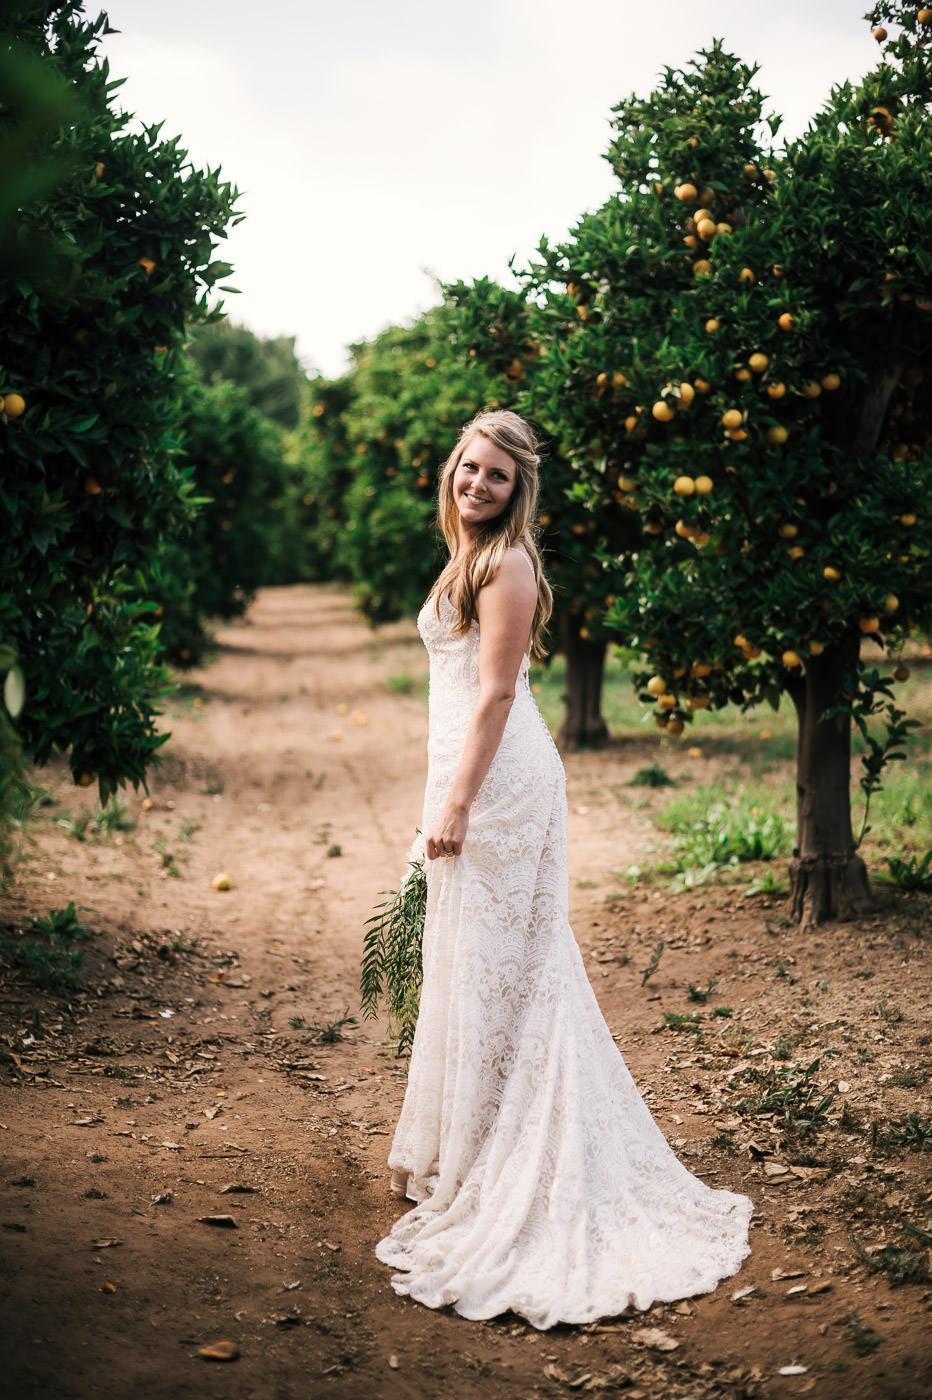 Wedding photographer takes portraits of the bride walking through the orange trees of Temecula California.